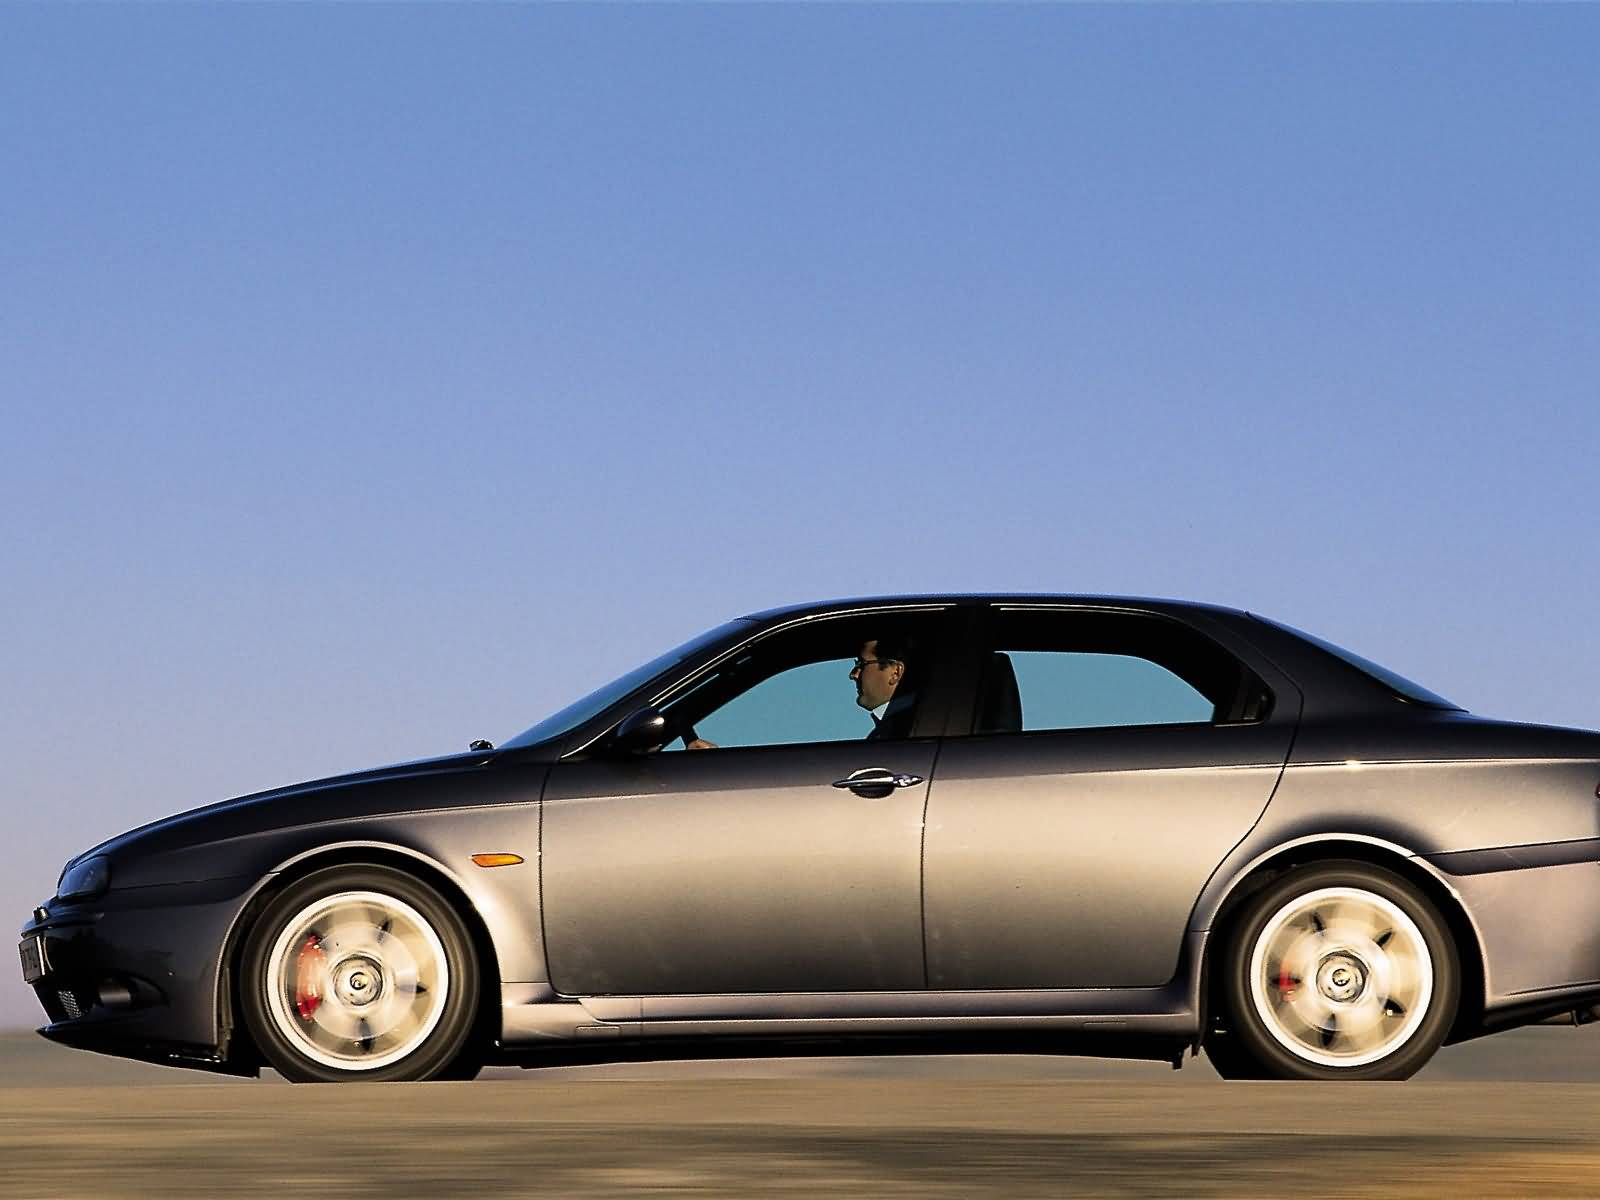 Left side of beautiful Alfa Romeo 156 GTA Car